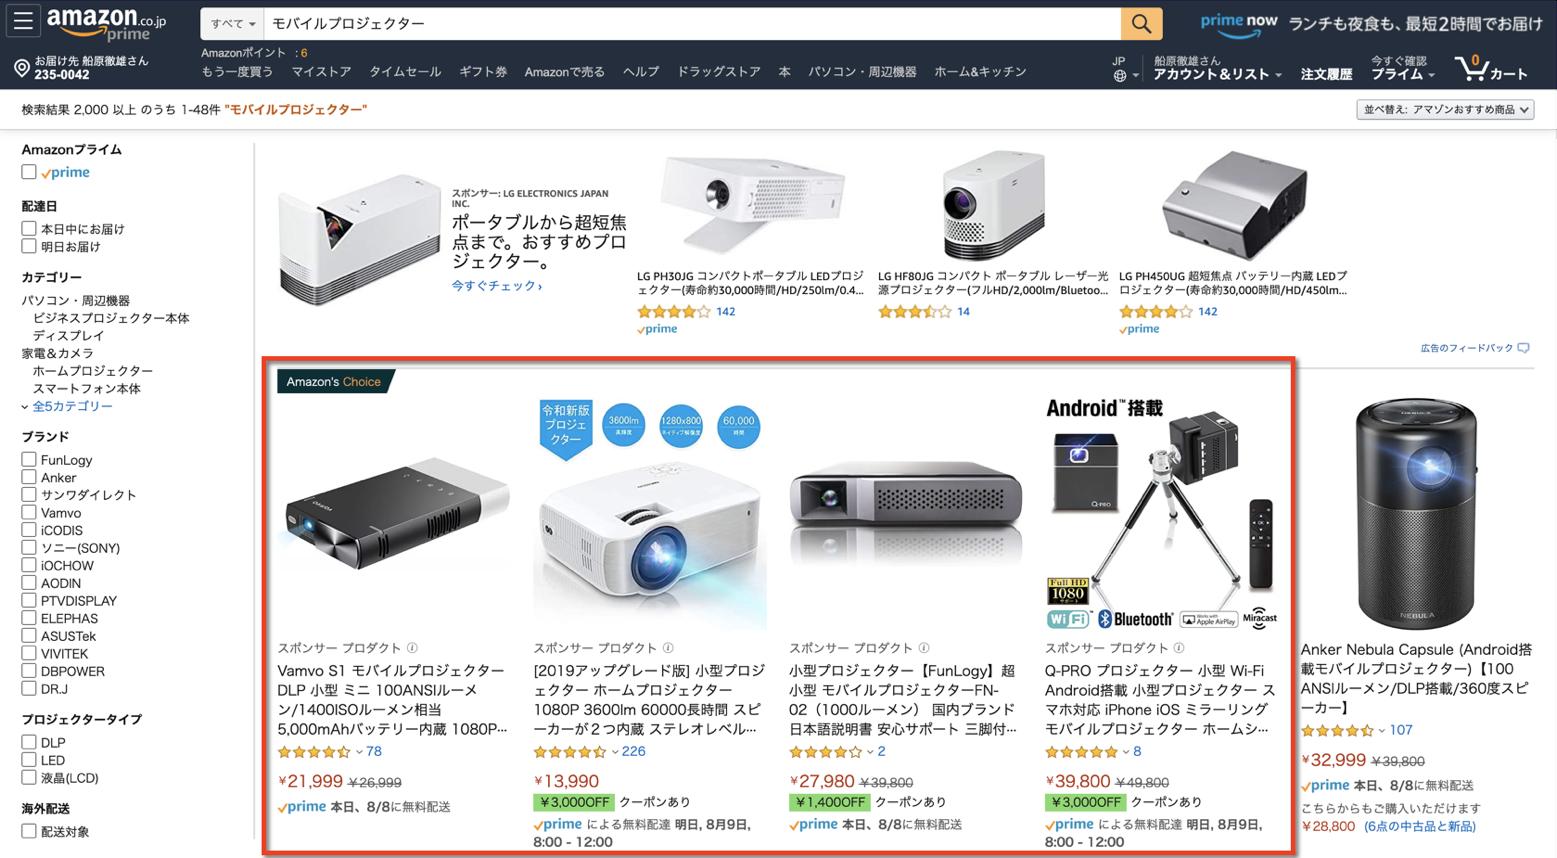 amazonスポンサープロダクト広告 検索結果